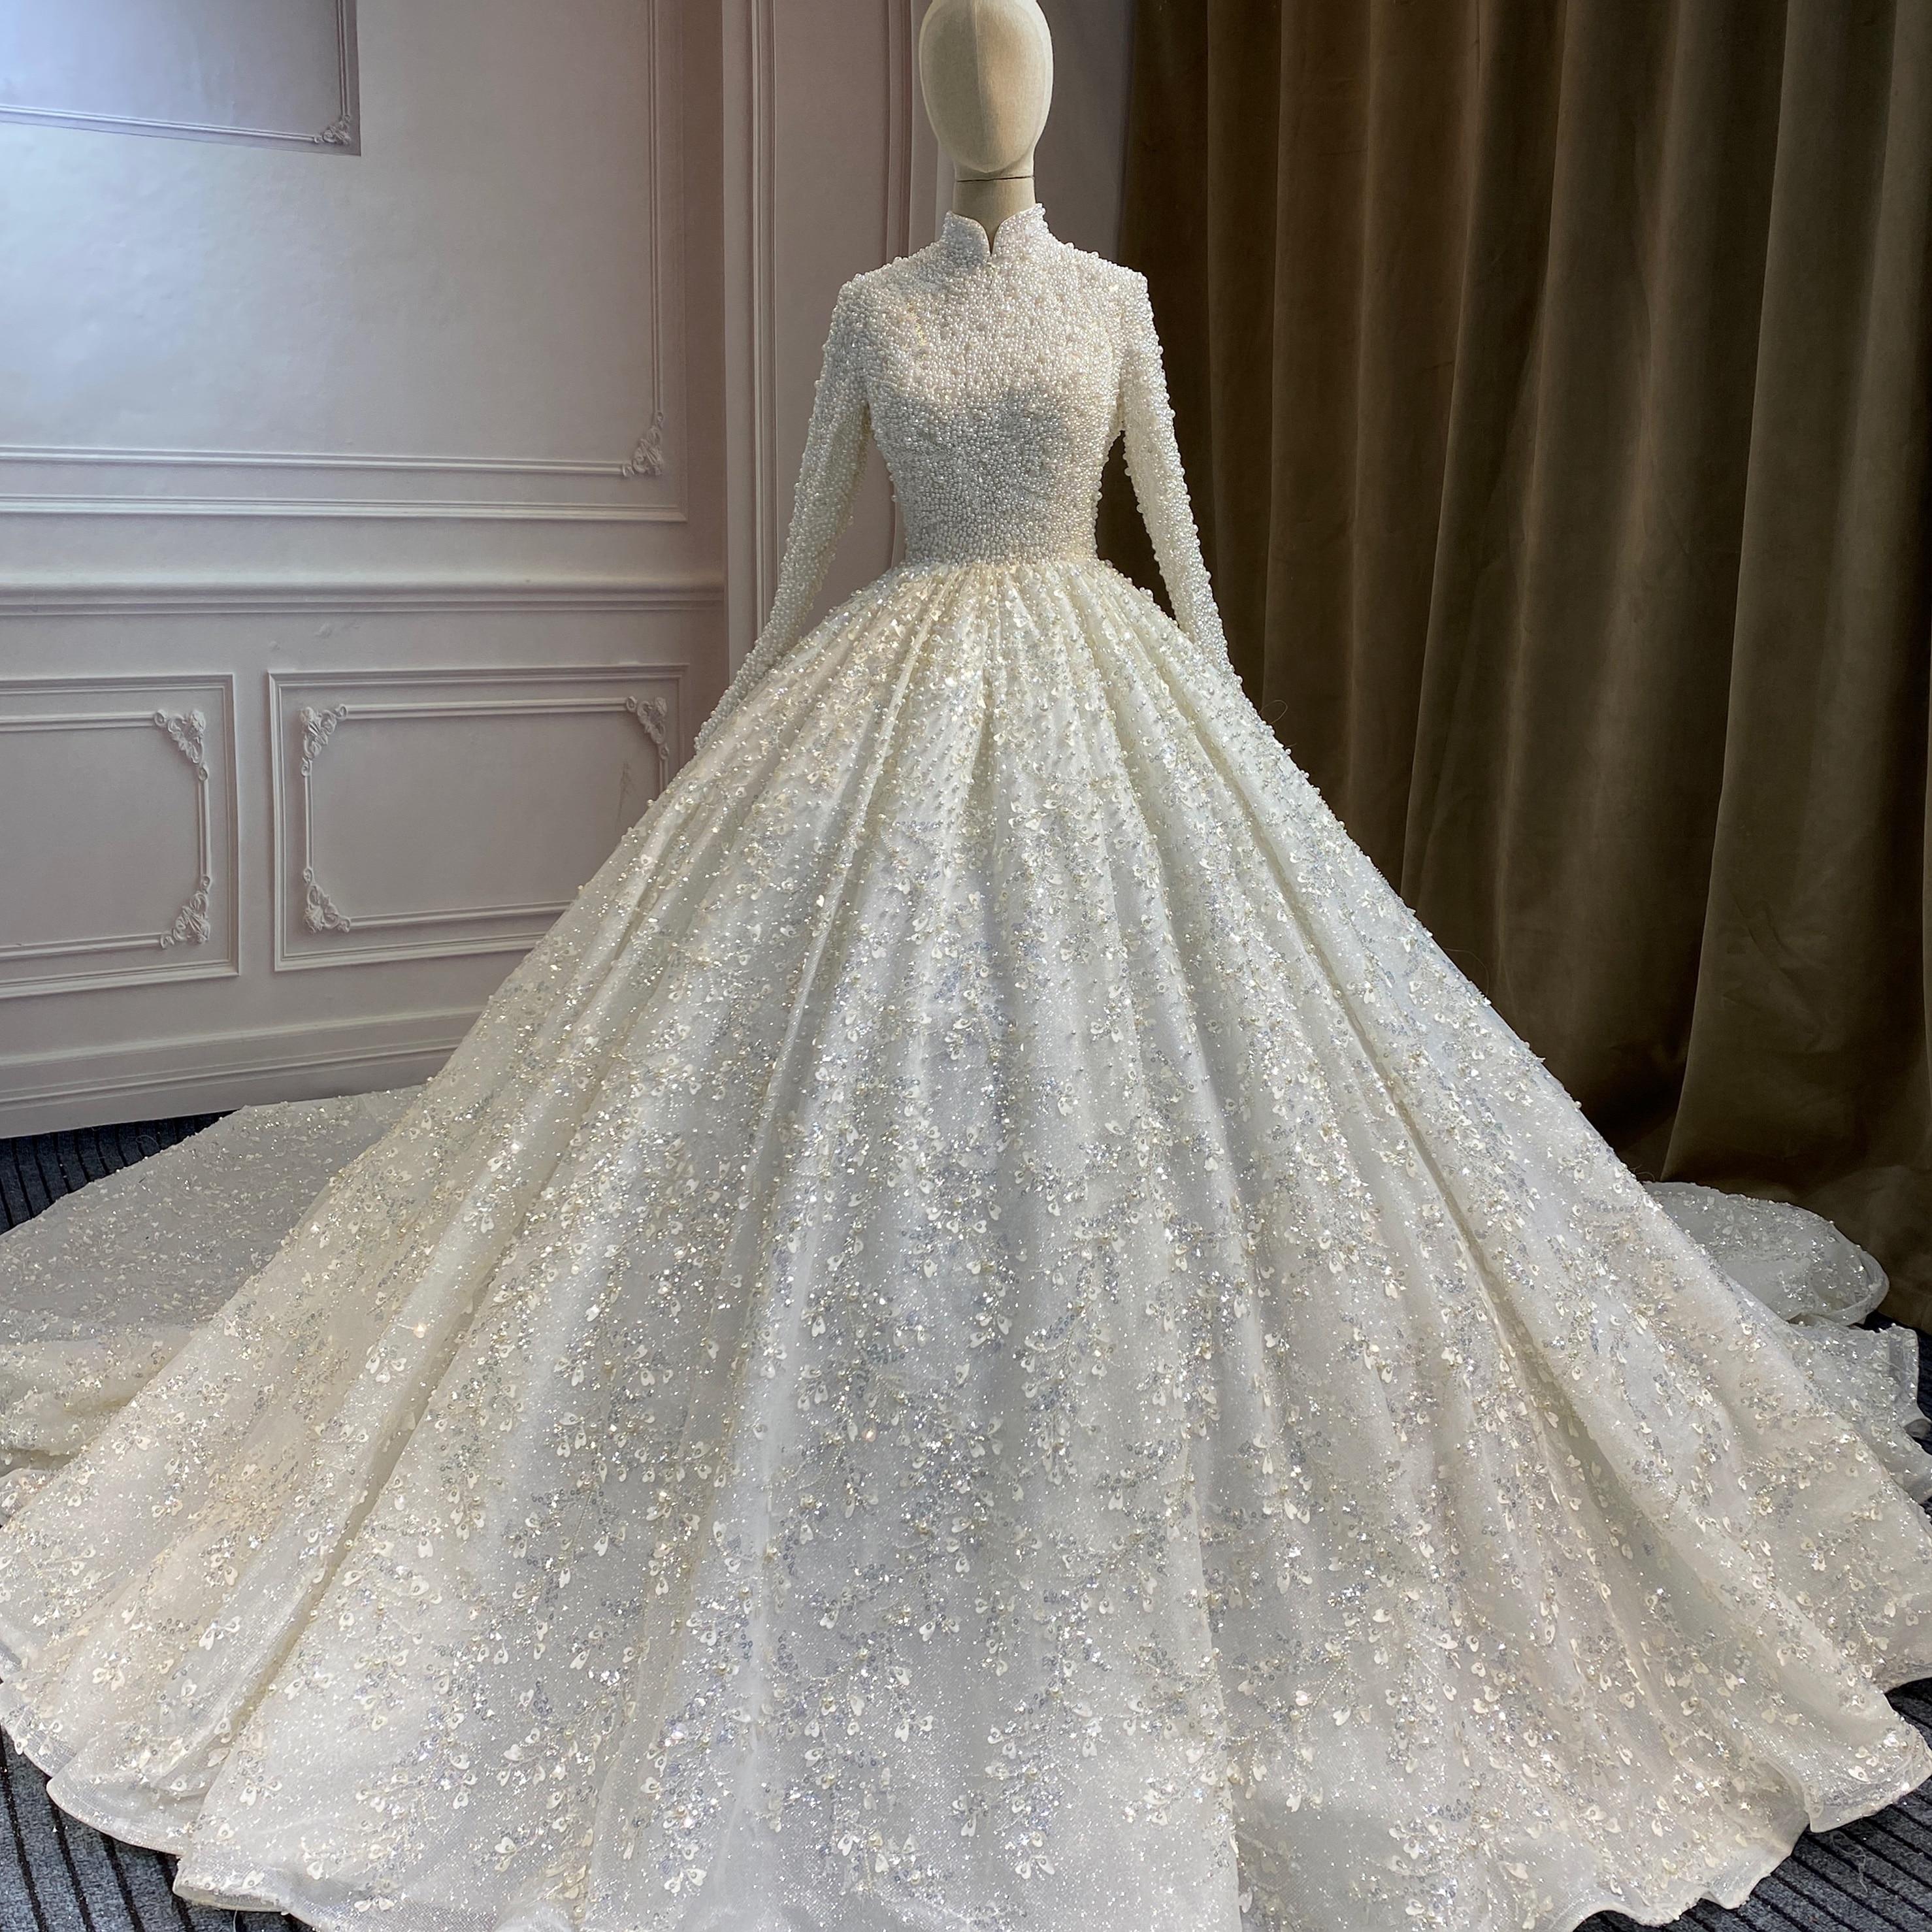 Marnham Modest Custom Ivory White Arab Lace Muslim Bridal Gown Long Sleeves High Neck Wedding Dress Full  Pearls